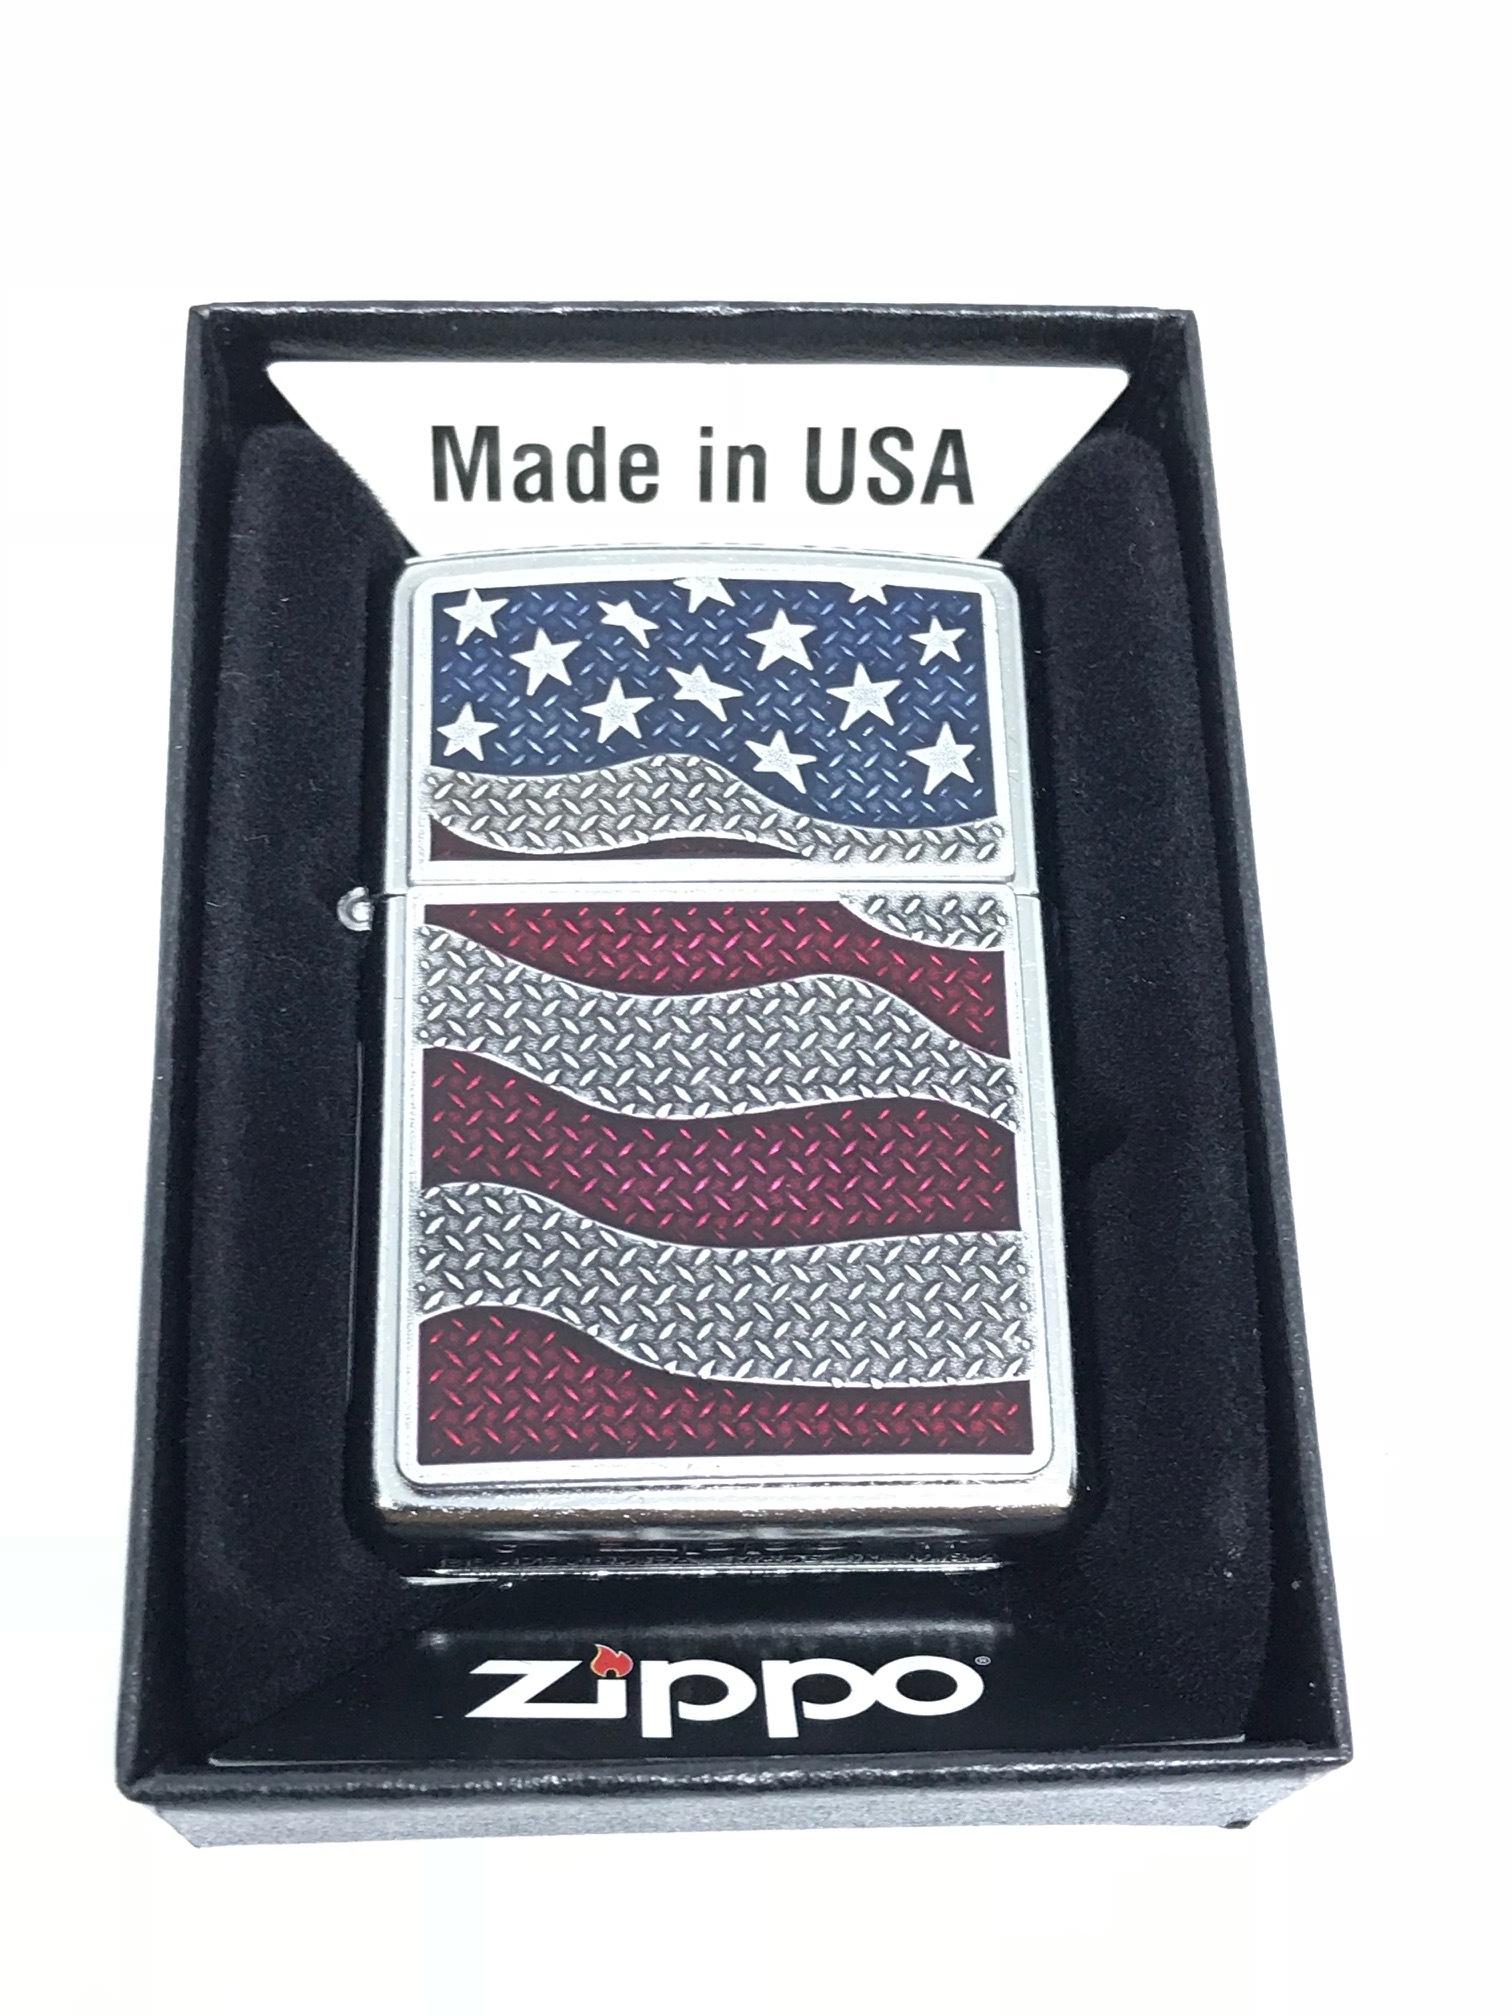 Zippo diamond plate flag ntz570 2